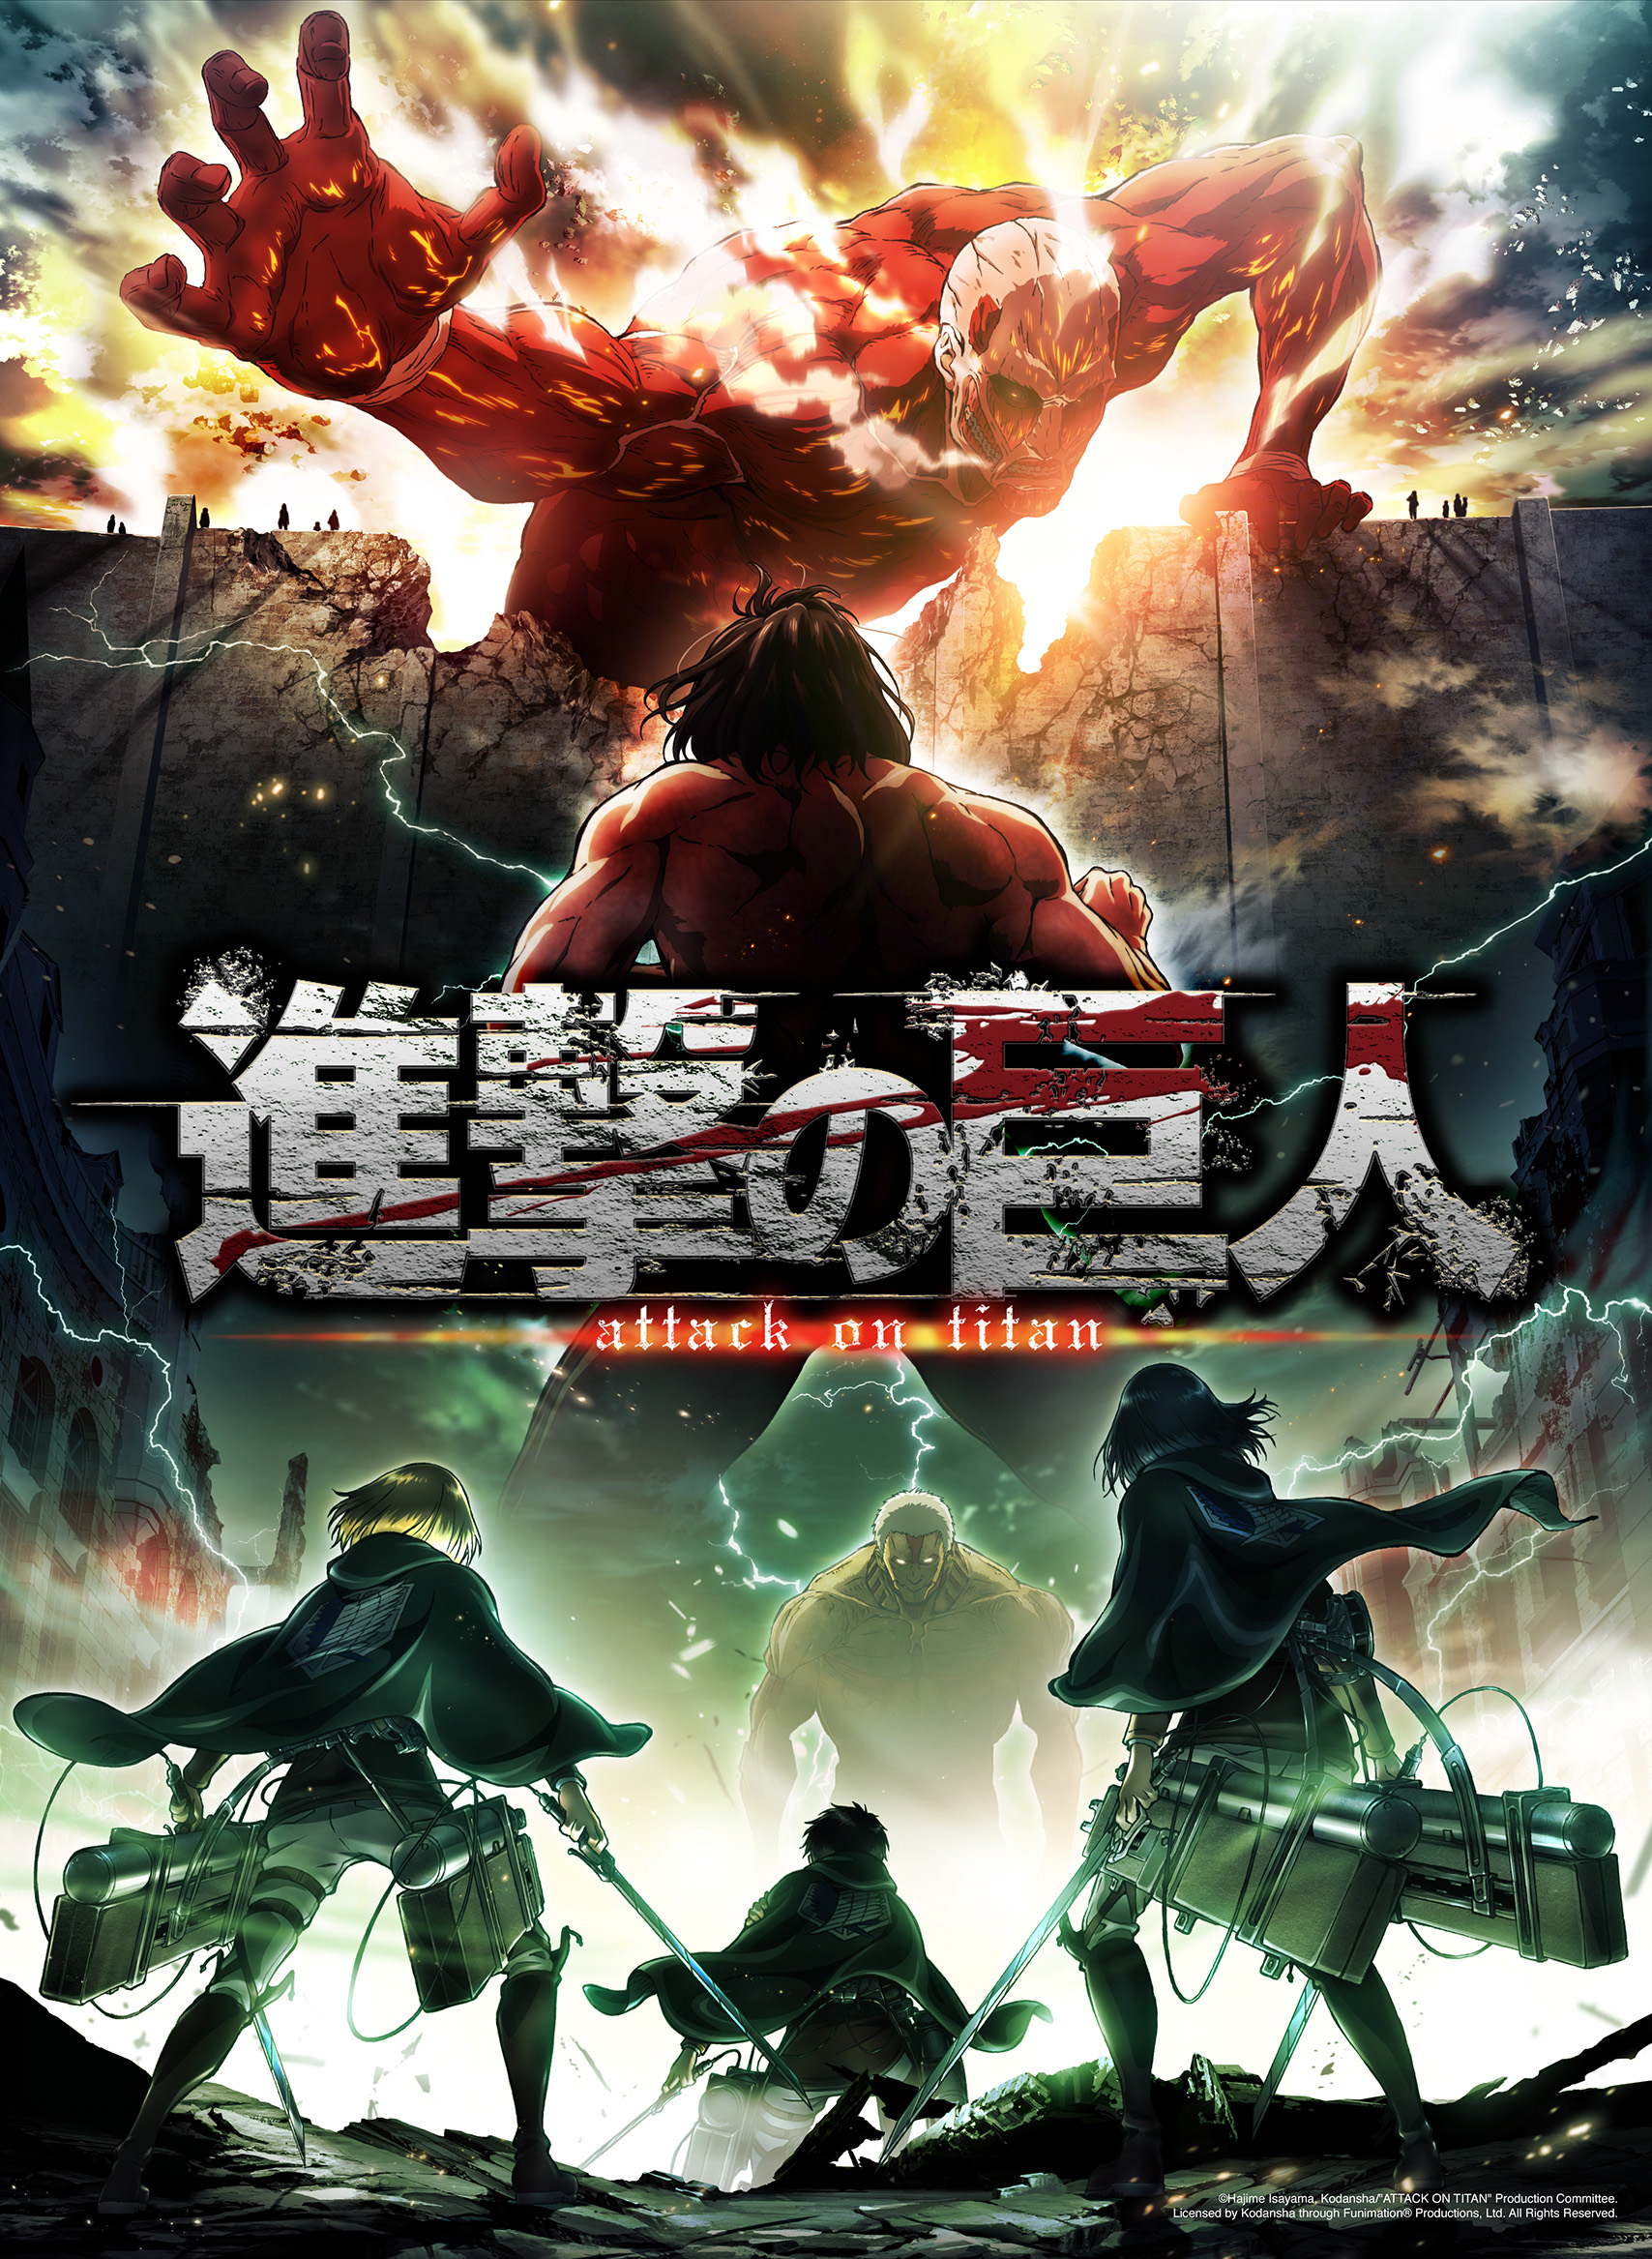 attack on titan download full movie